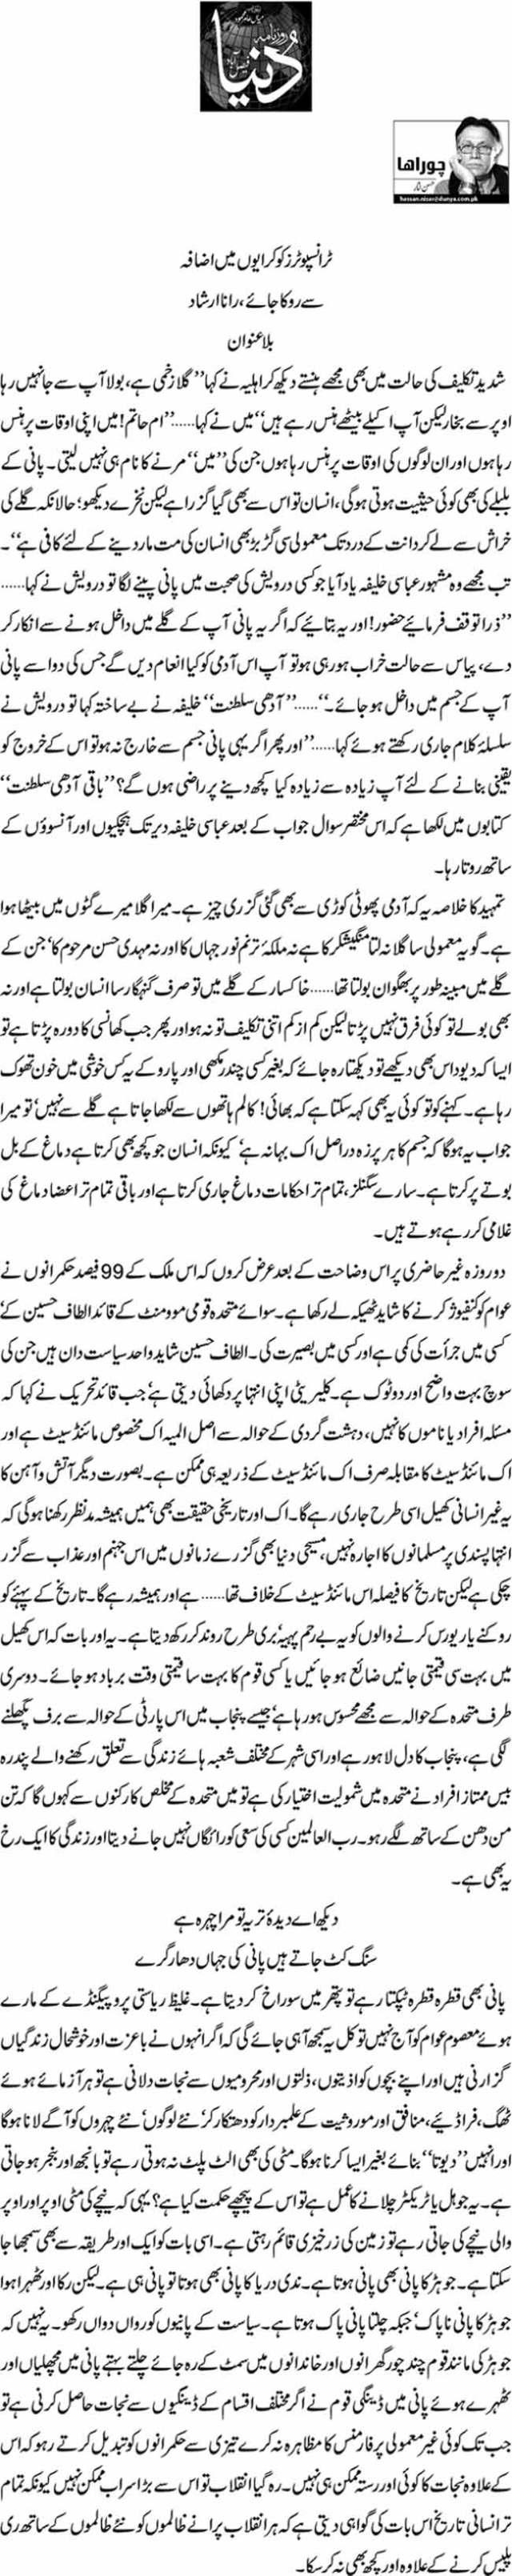 Bila unwan - Hassan Nisar